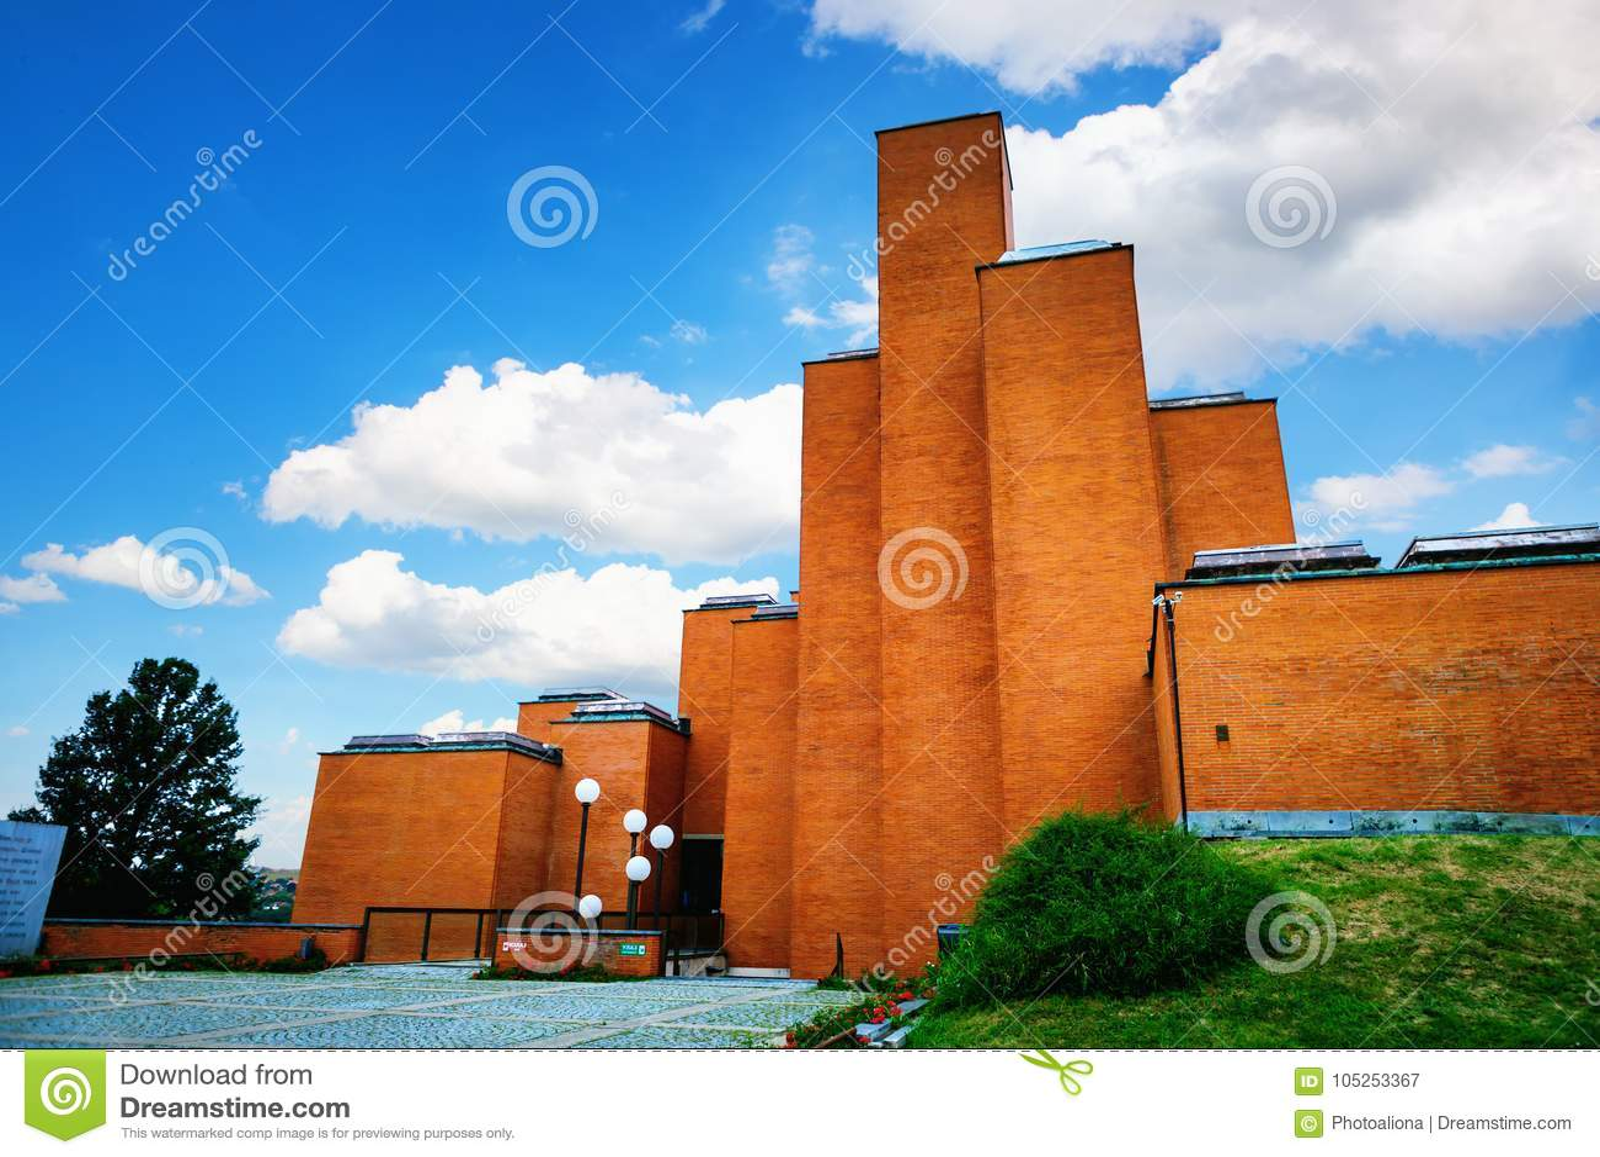 Kragujevac, Serbie - 17 juillet 2016 : Musée et parc commémoratifs 21 octobre dans Kragujevac, Serbie